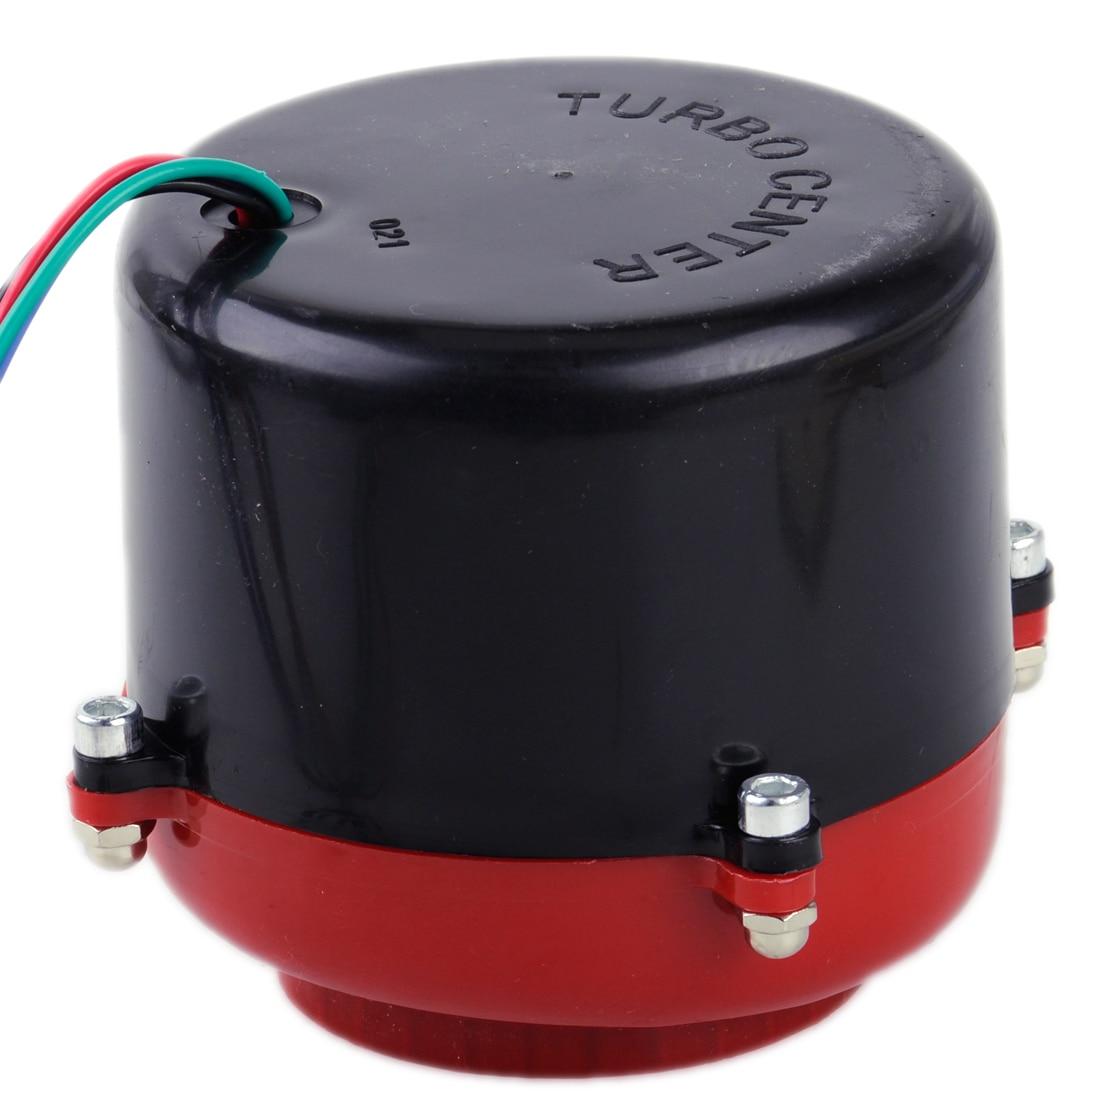 Kit de simulador BOV de sonido analógico con válvula de enganche Turbo SSQV electrónico para coche beler